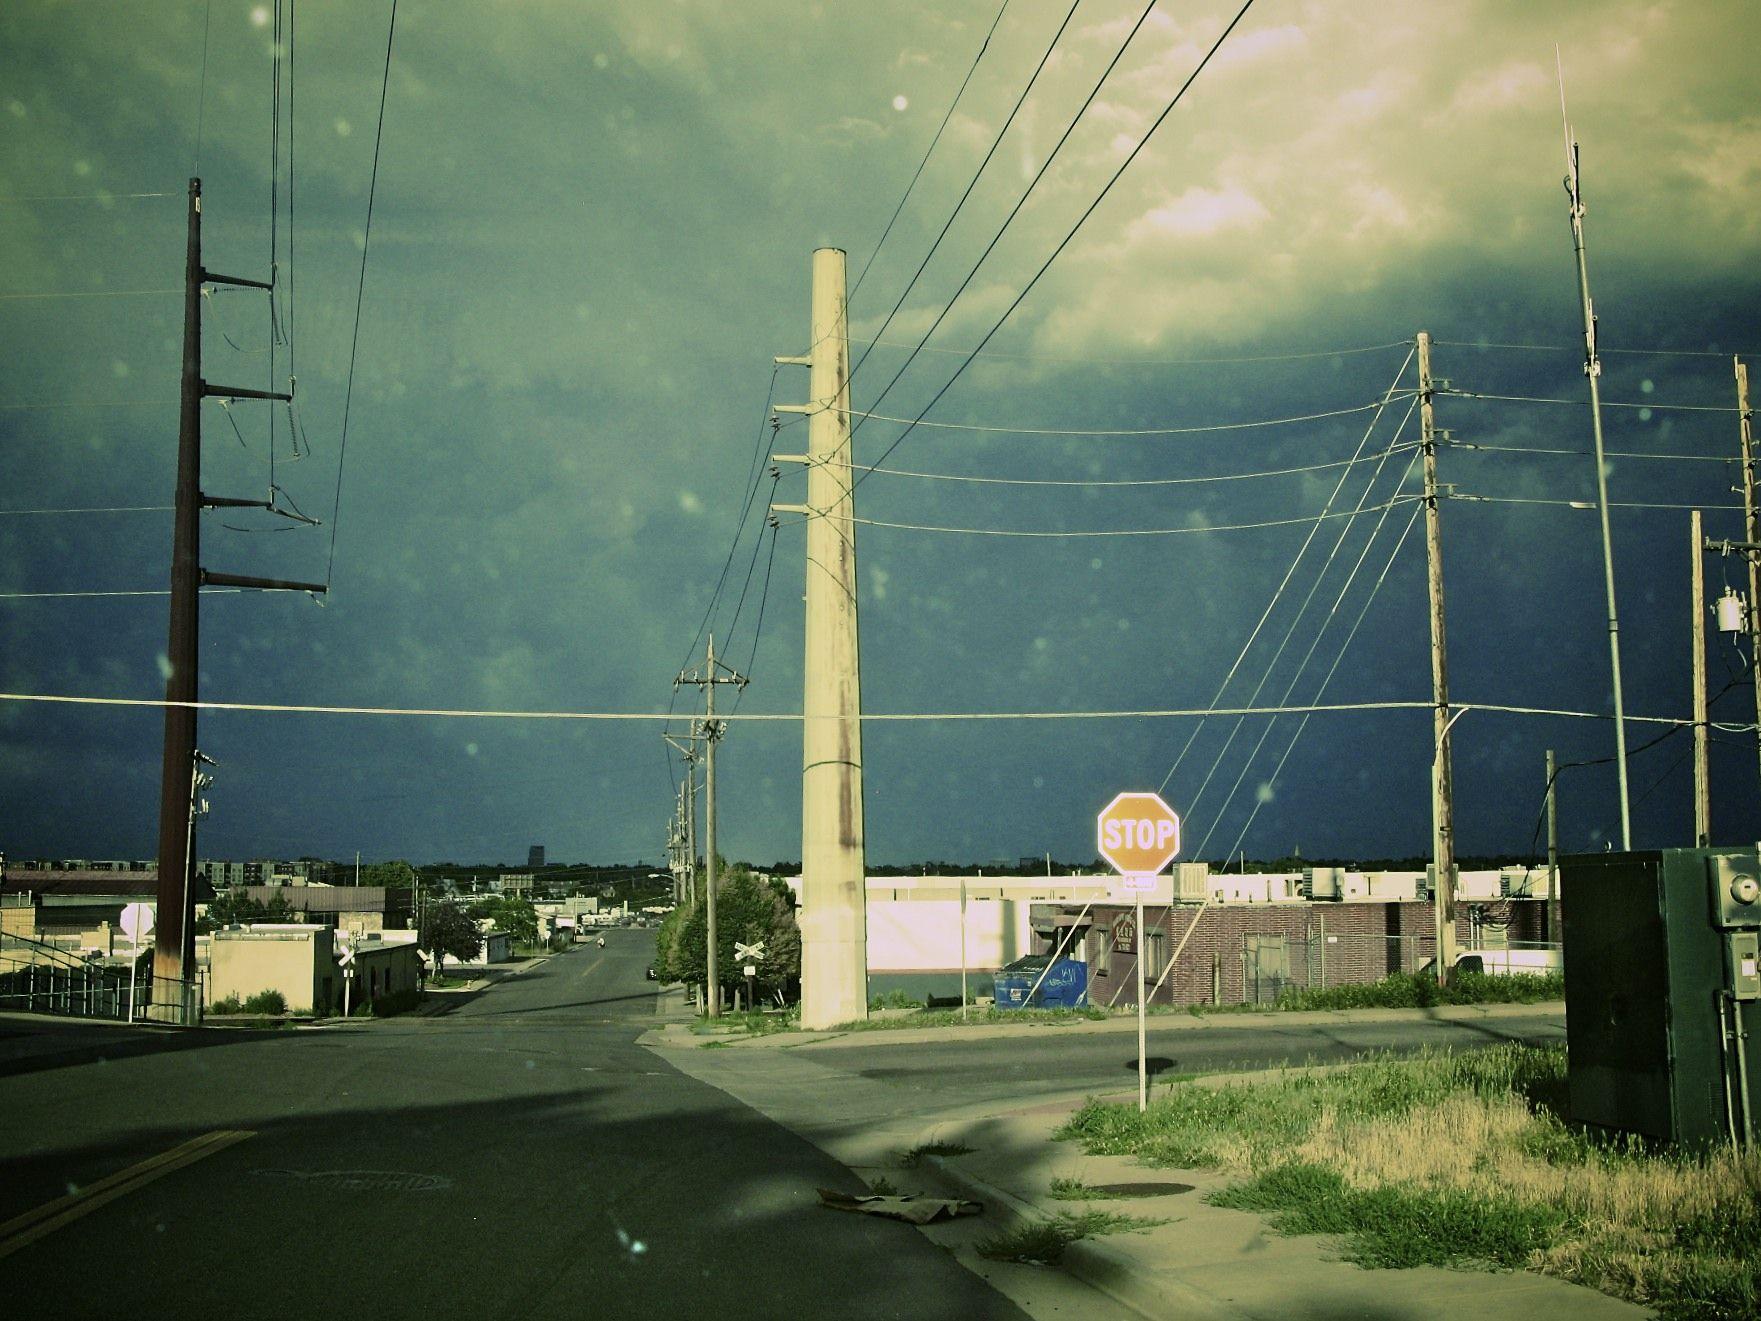 Before the Storm, Robert Alan Clayton